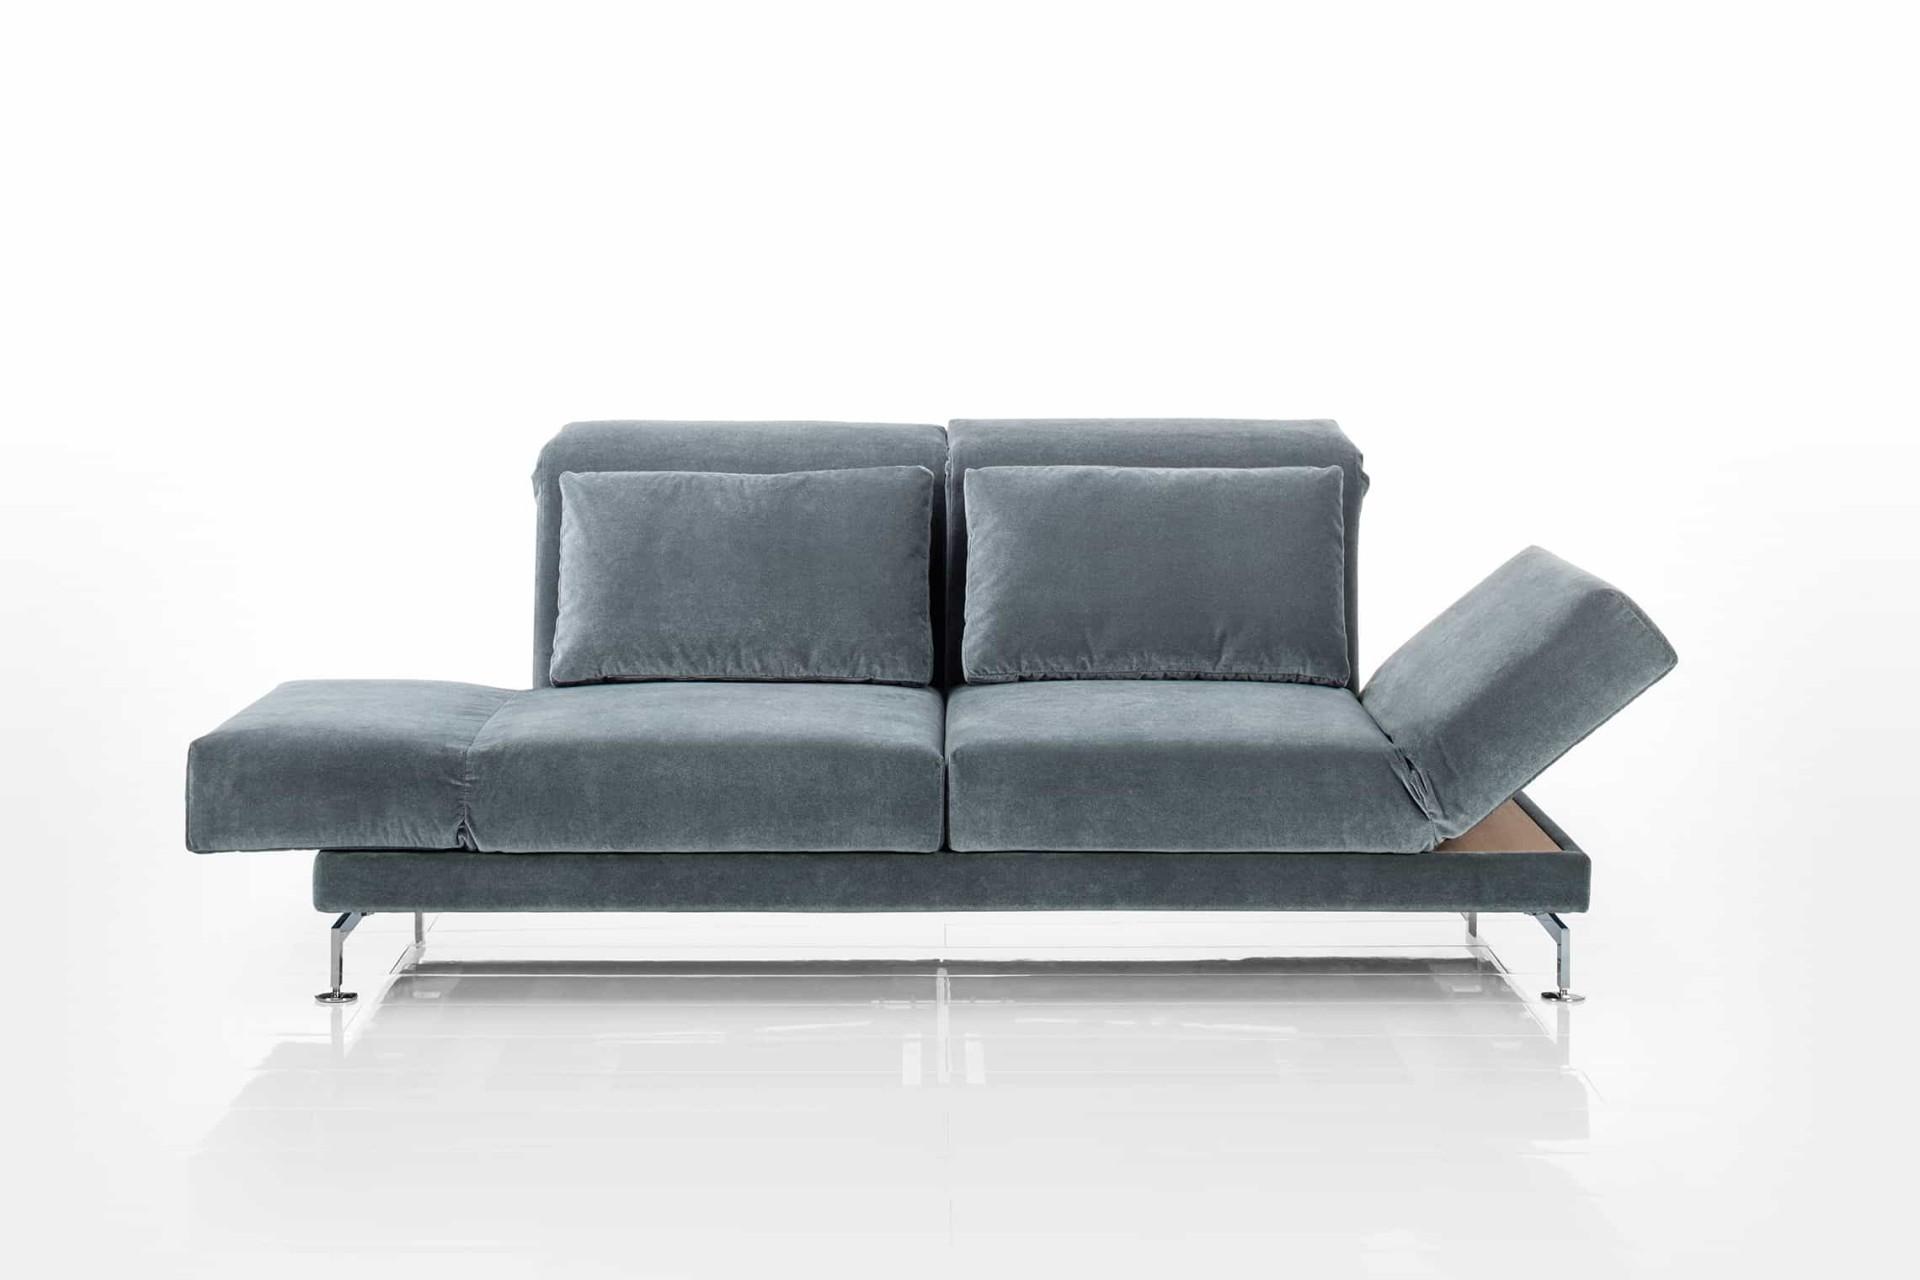 Bruhl Design Sofa Moule 2 Medium